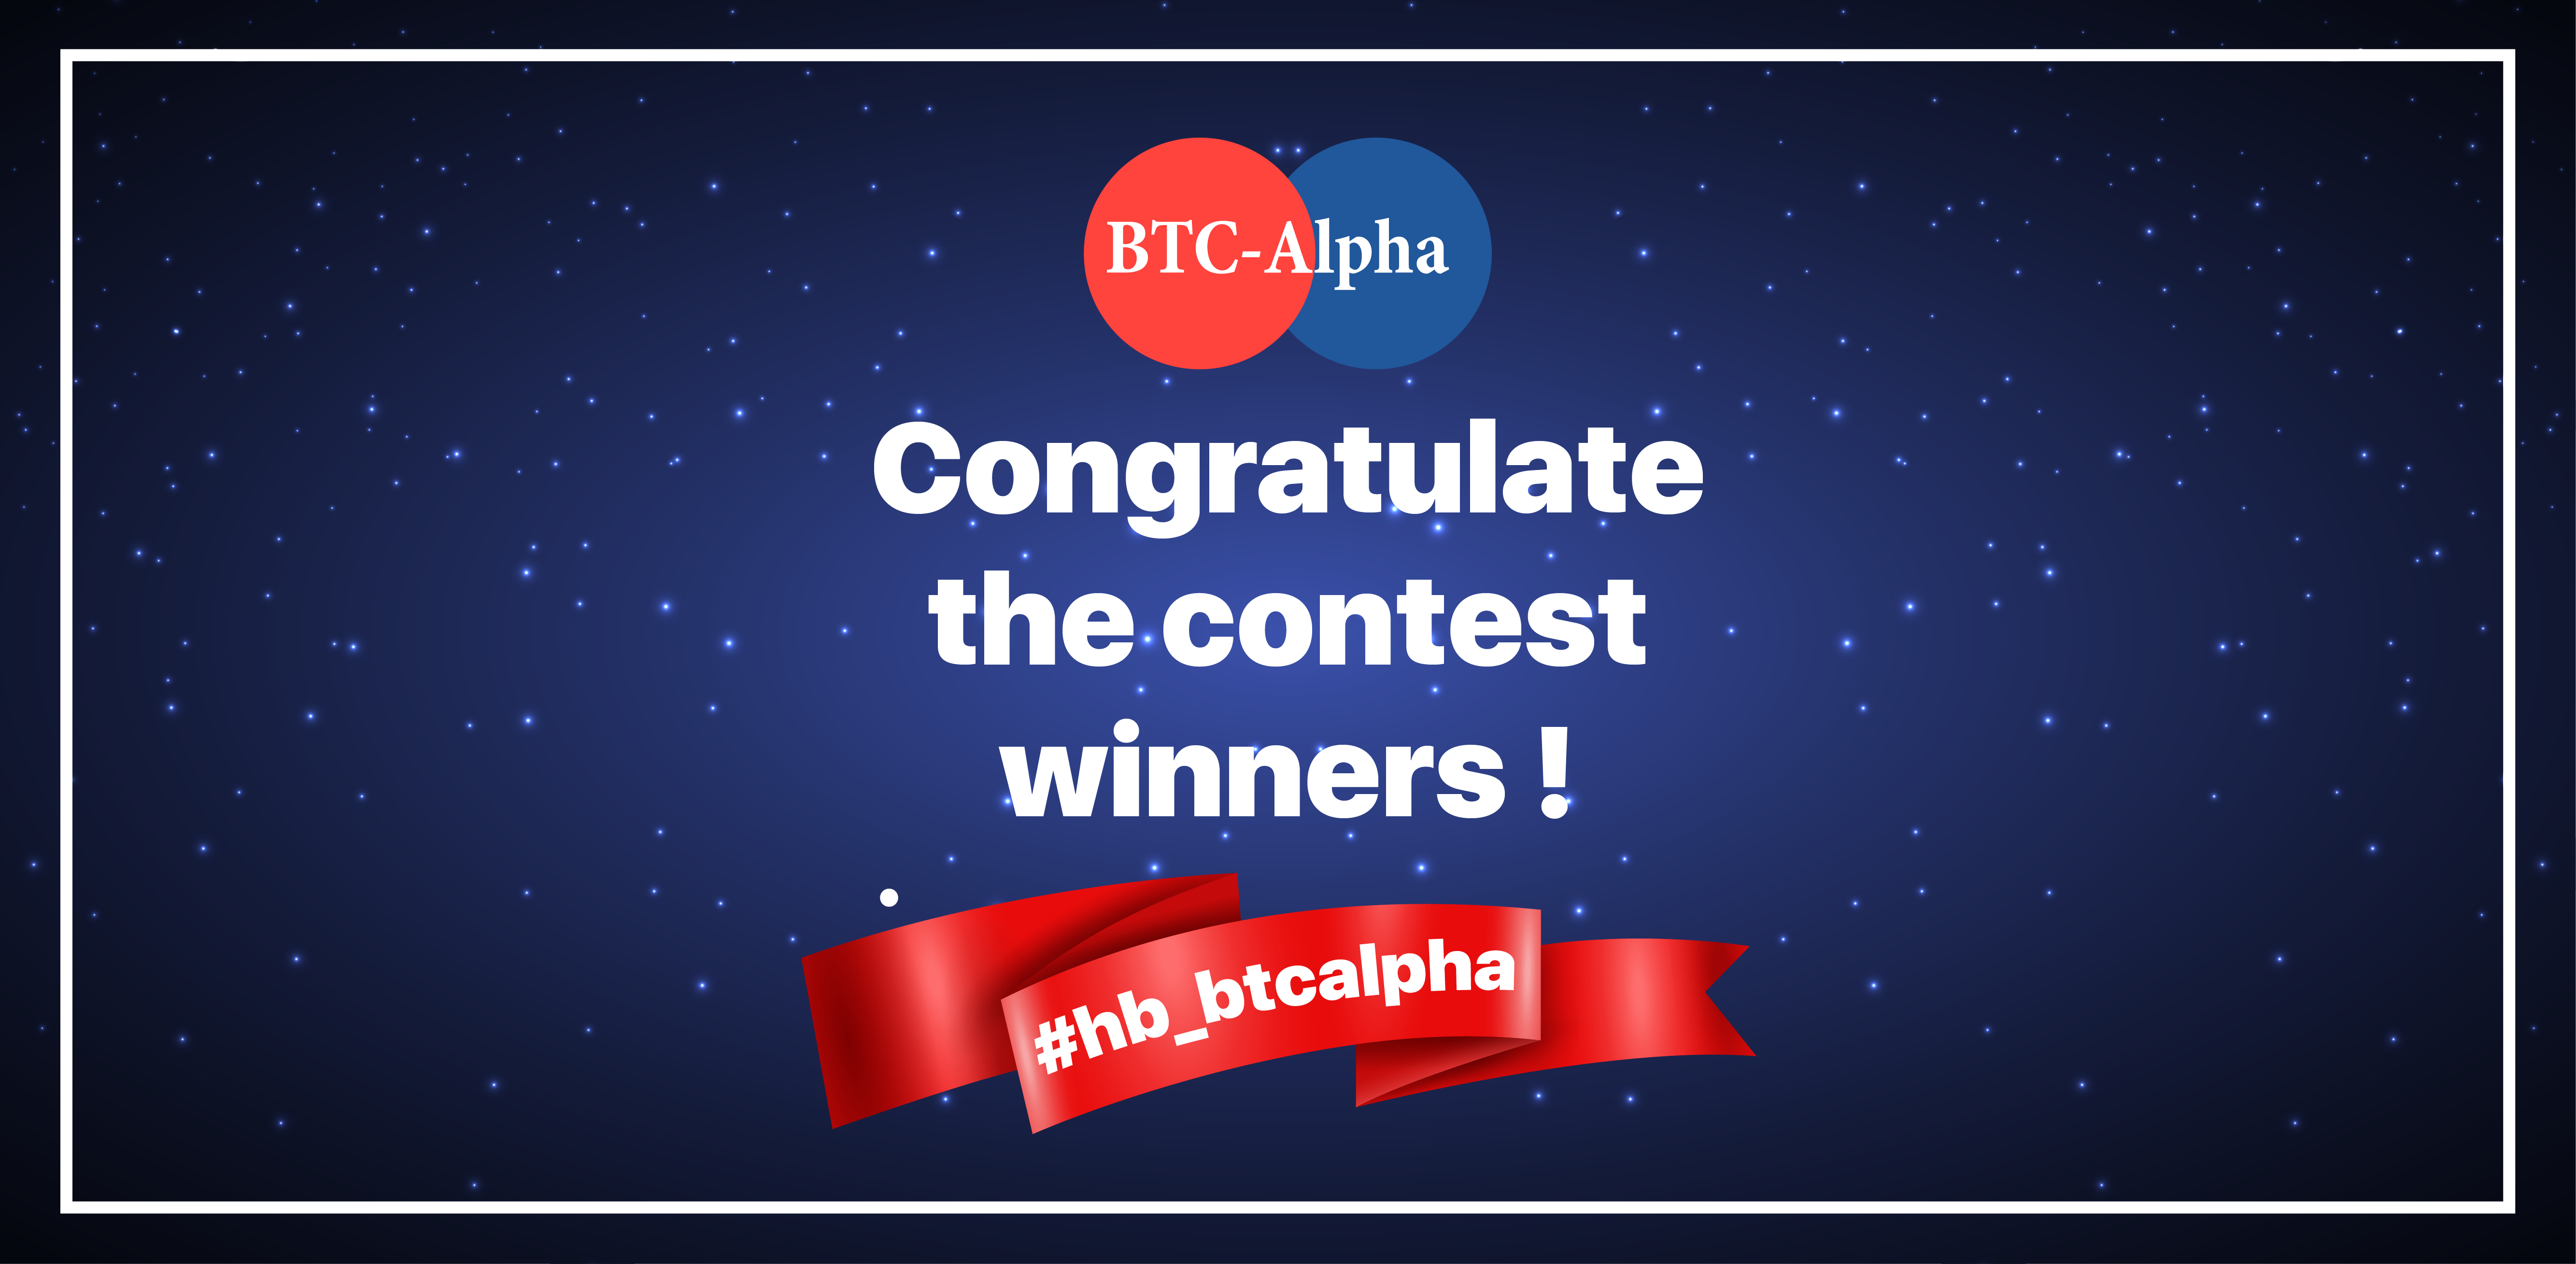 BTC-Alpha's Birthday contest is over!